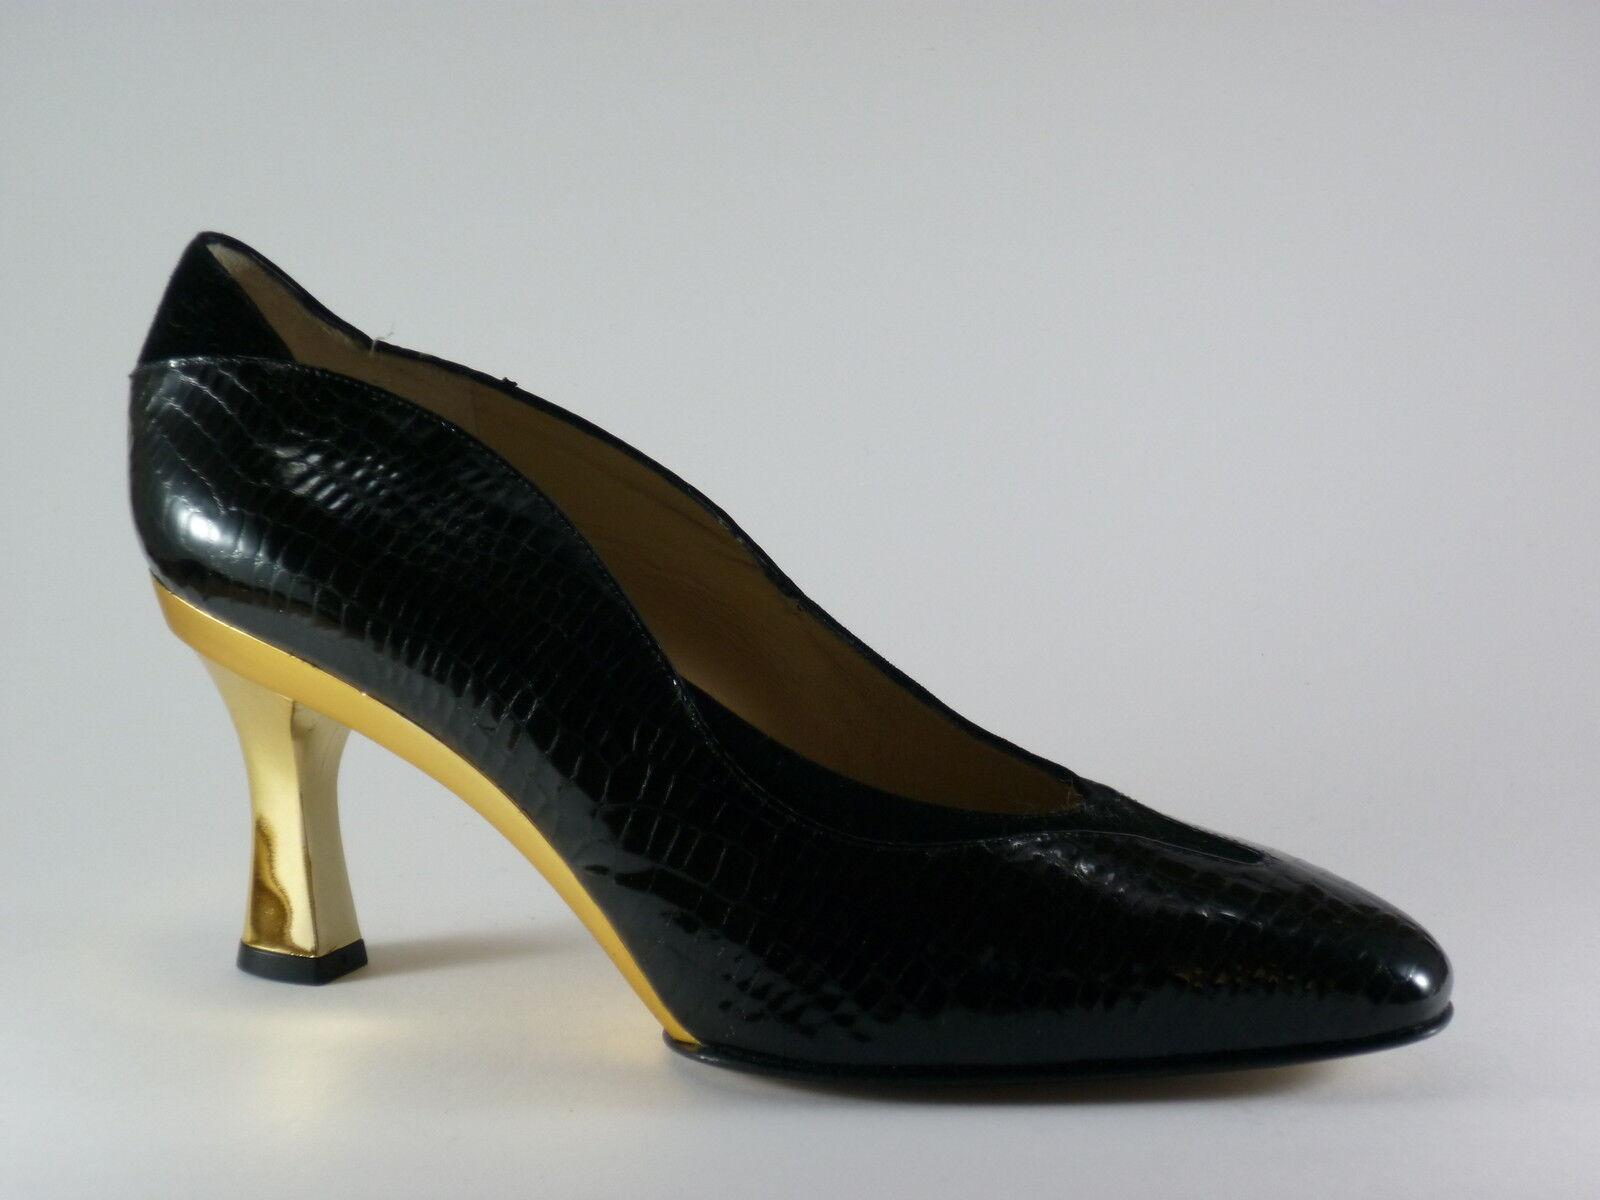 MARCANTONI Damen Gold Schuhe 40 Lack Velour Schwarz Gold Damen Abendschuhe Pumps NEU f2ce8e